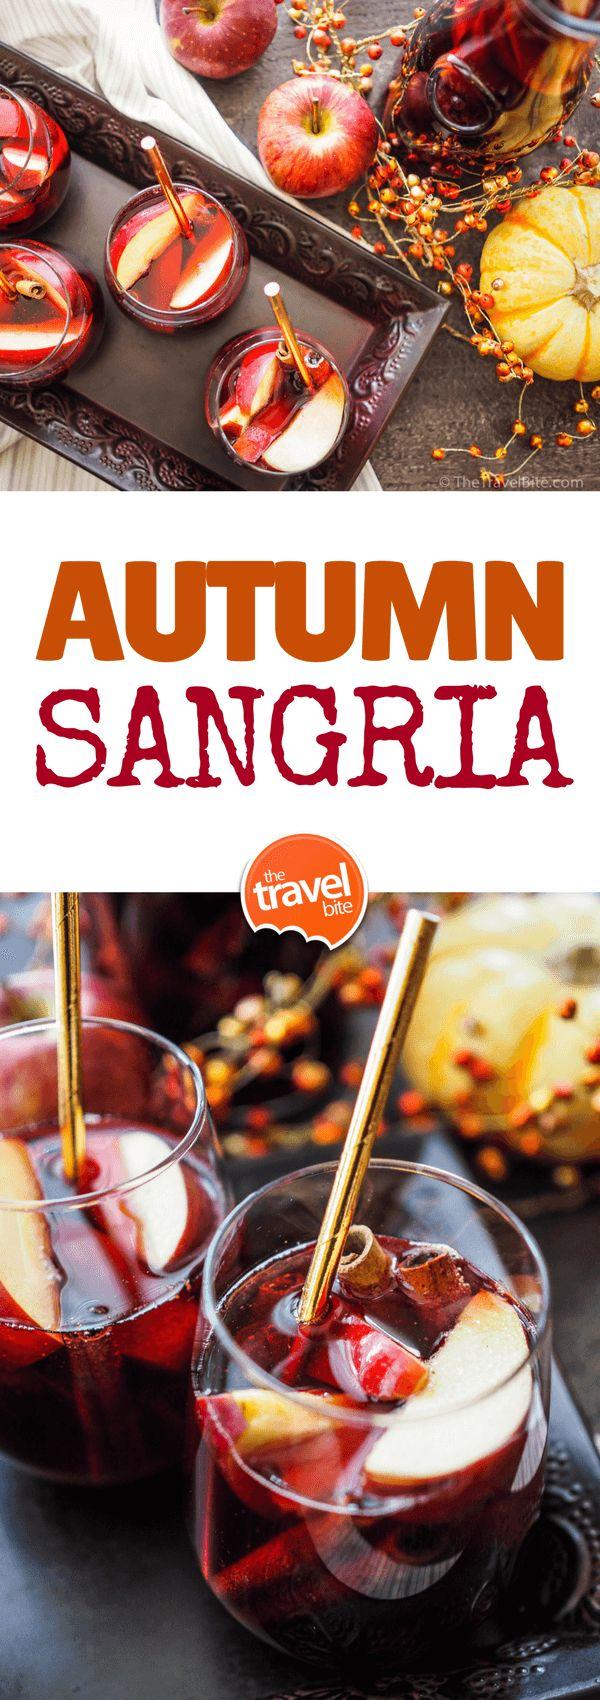 Autumn Sangria ~ http://thetravelbite.com